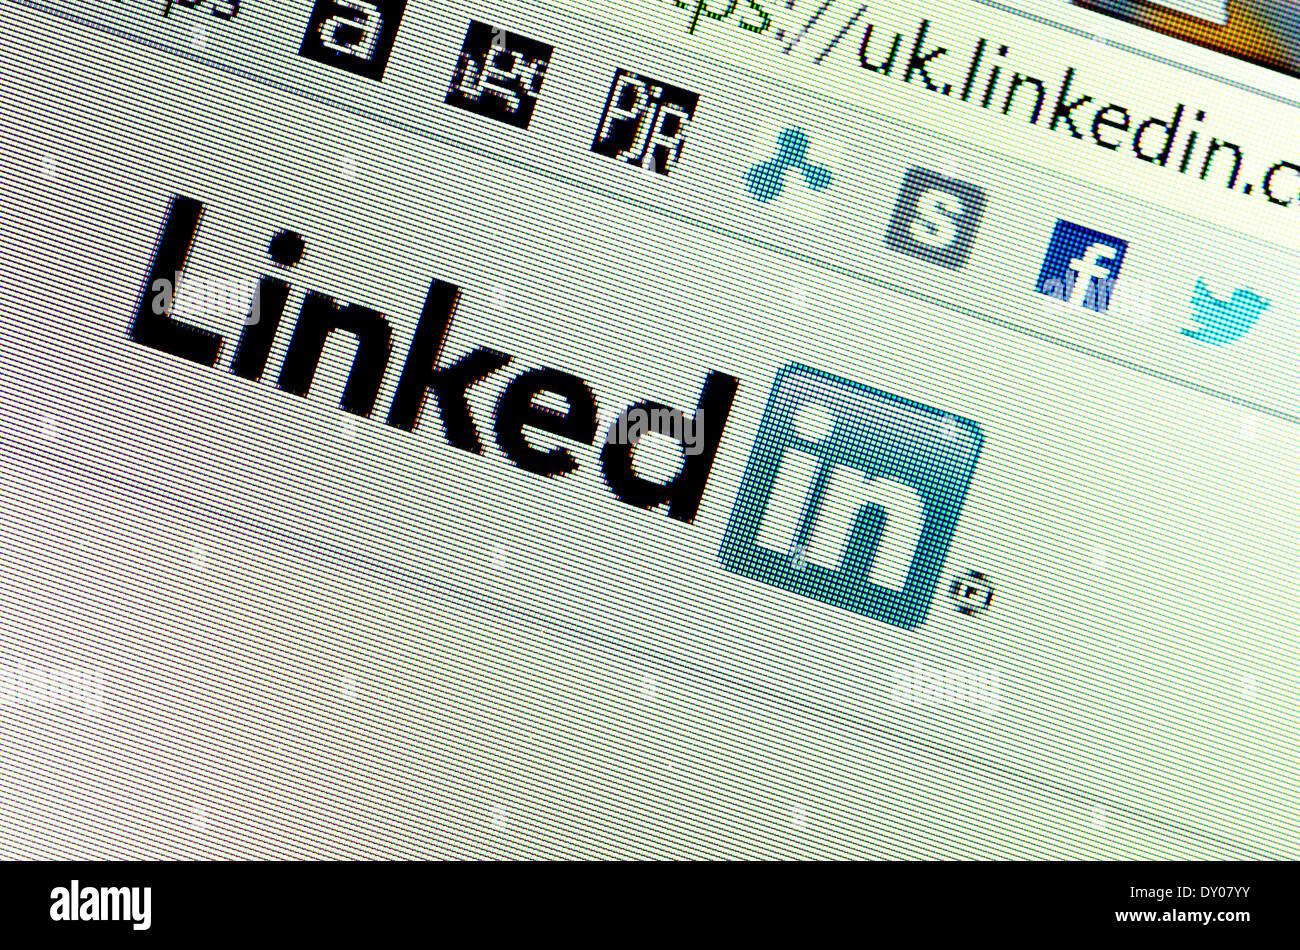 Computer screen shot - Linkedin website - Stock Image